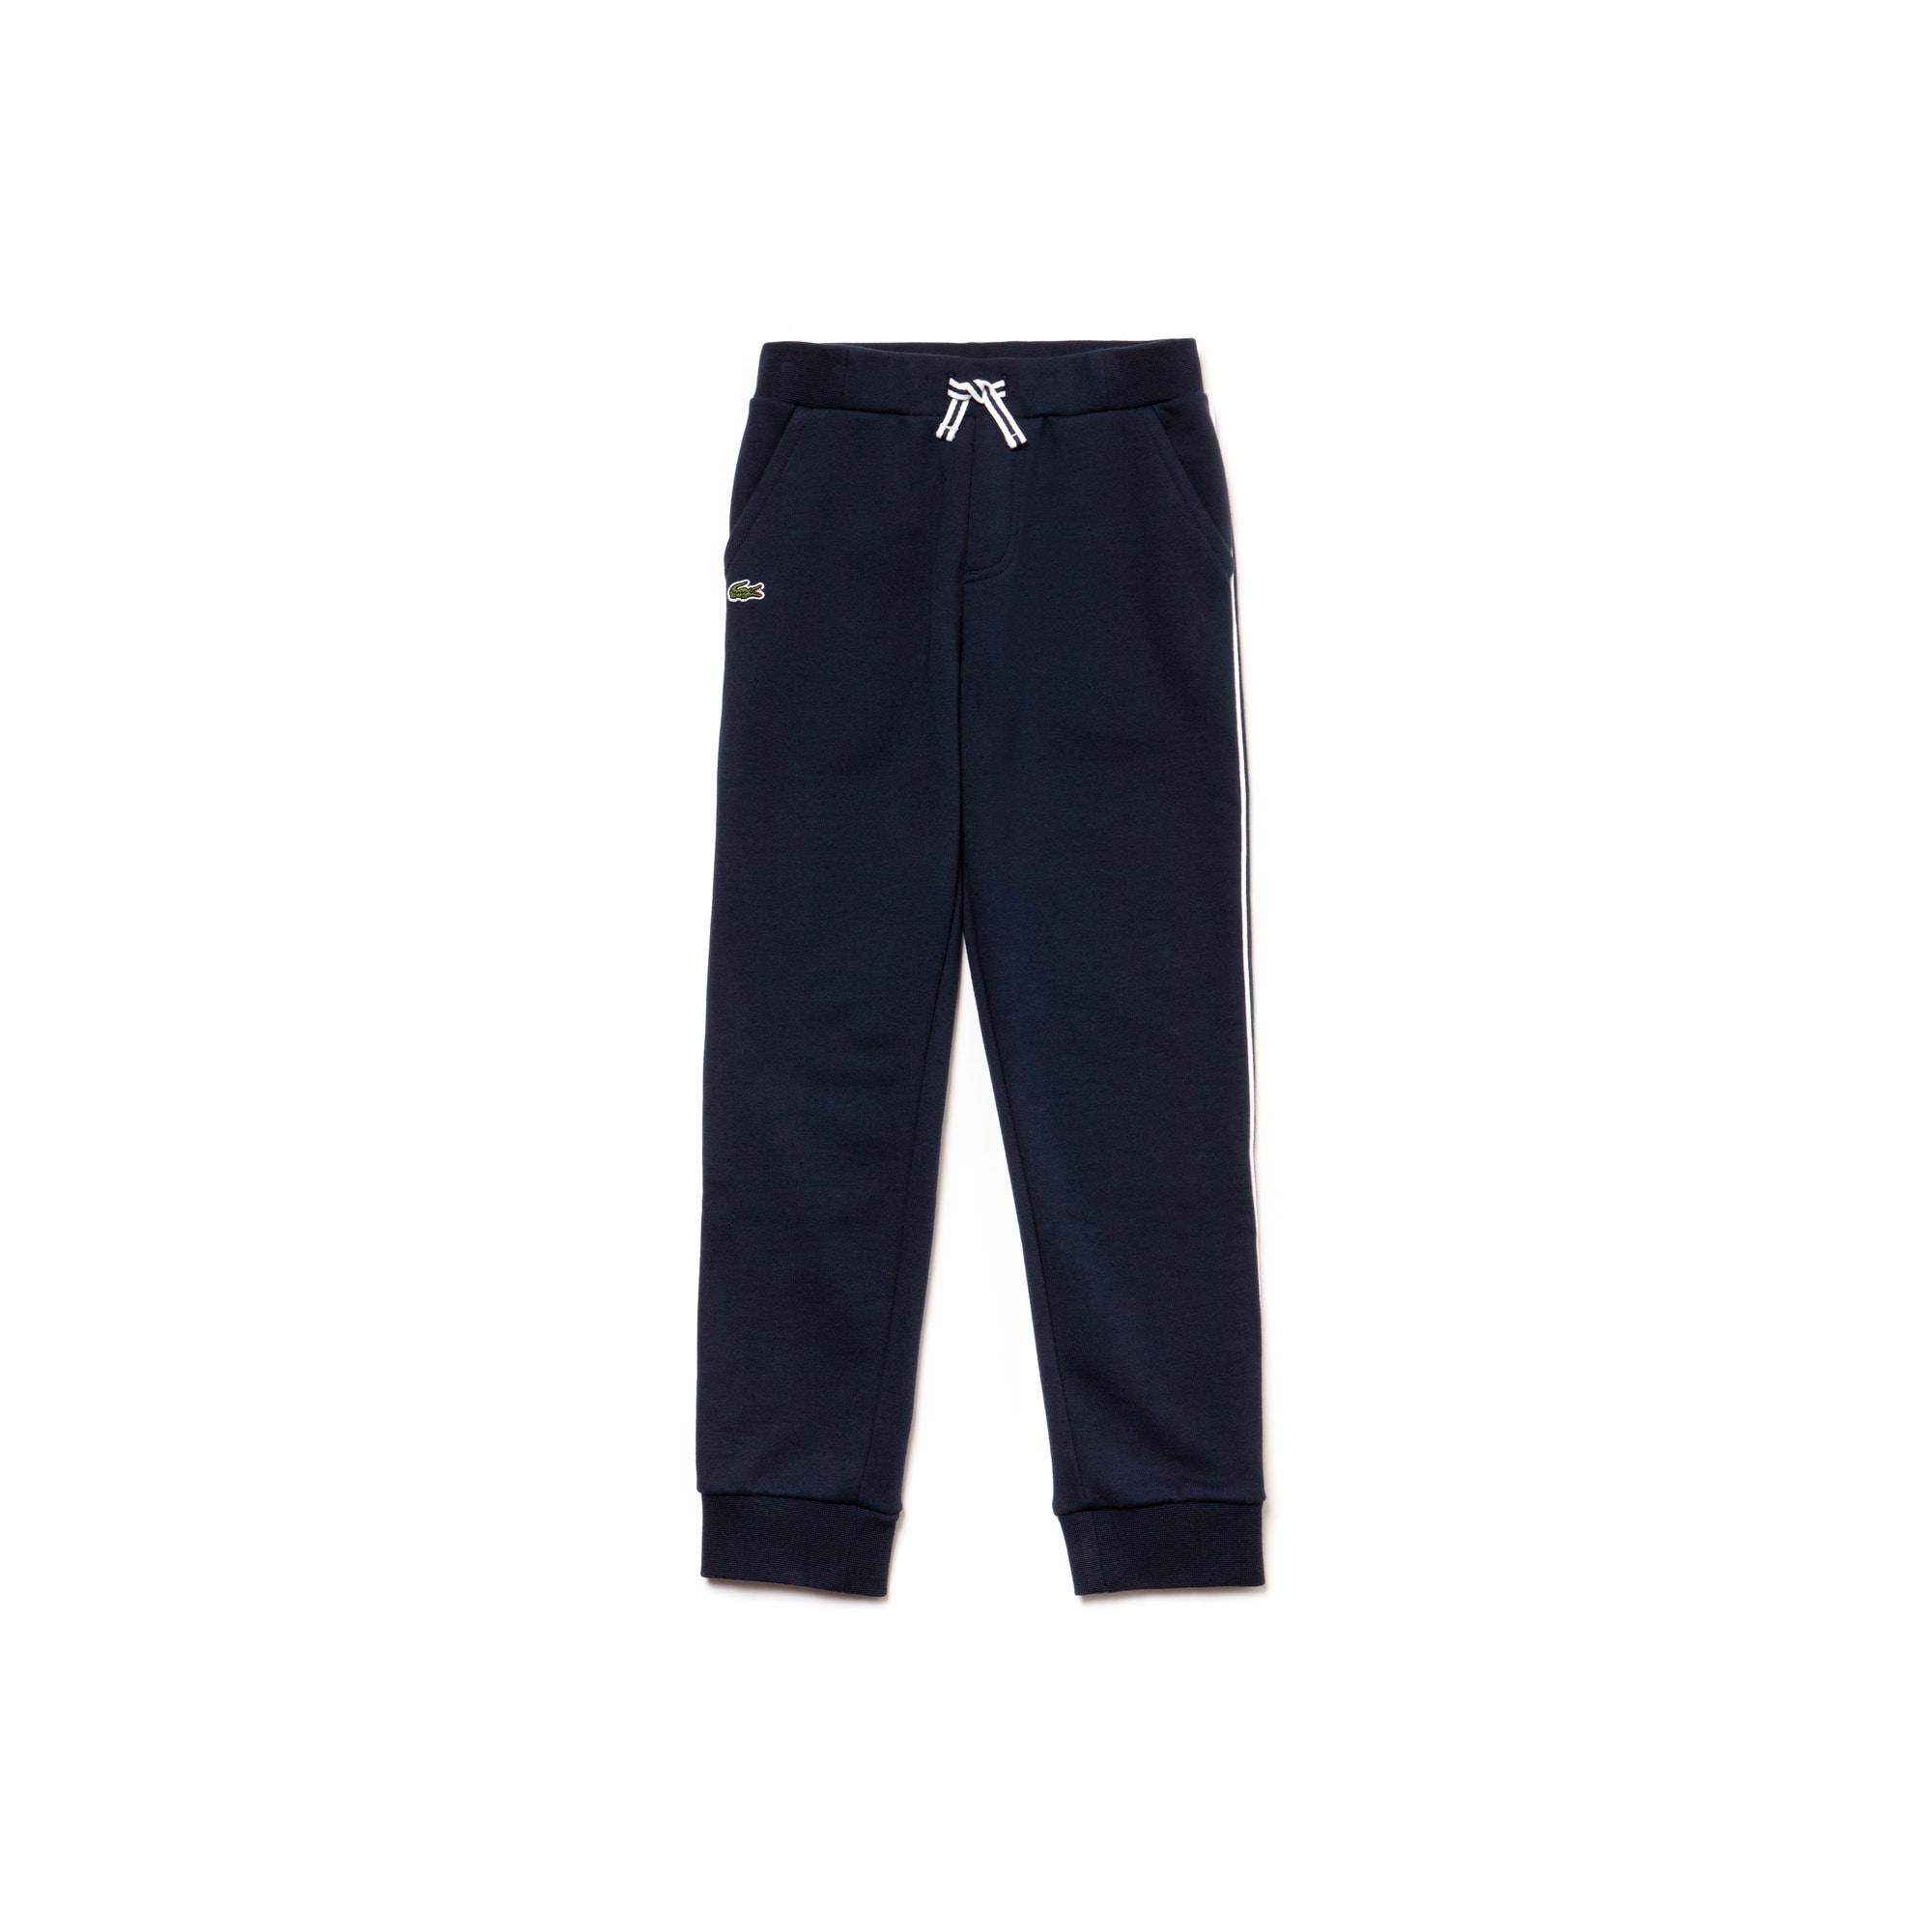 Jungen-Jogginghose aus Fleece mit Kontraststreifen